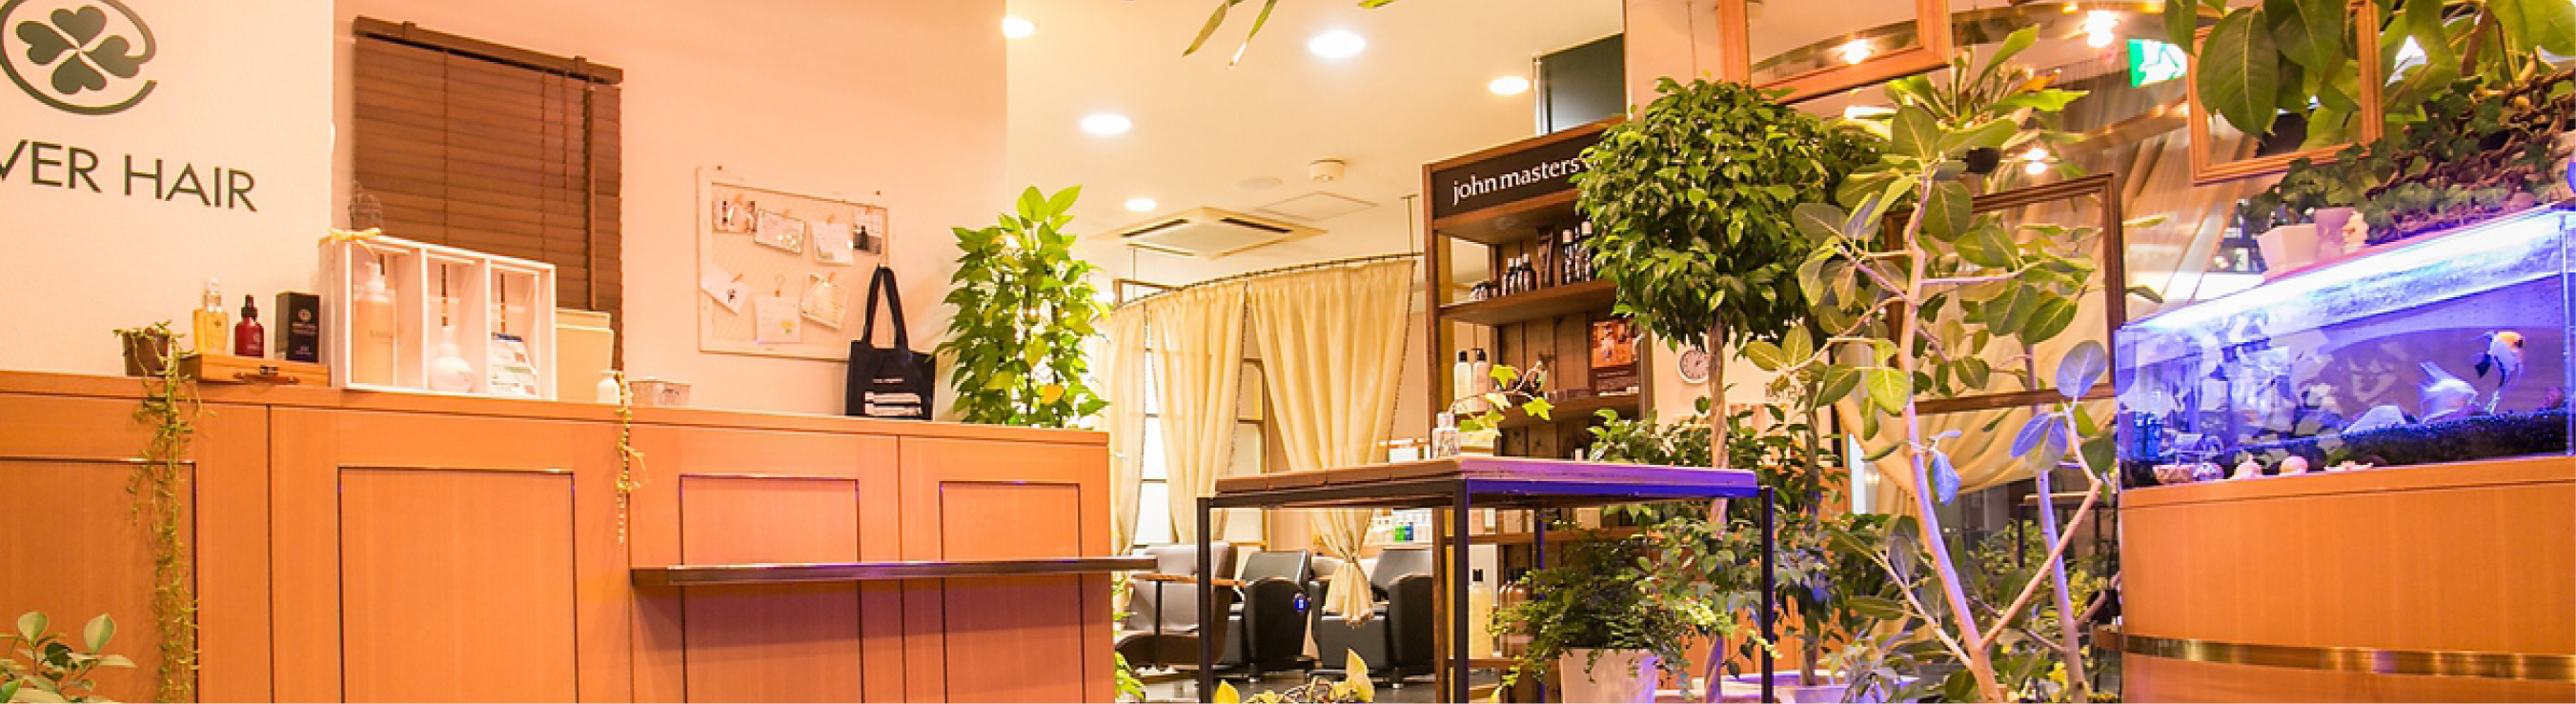 Coverhair bliss戸田公園店